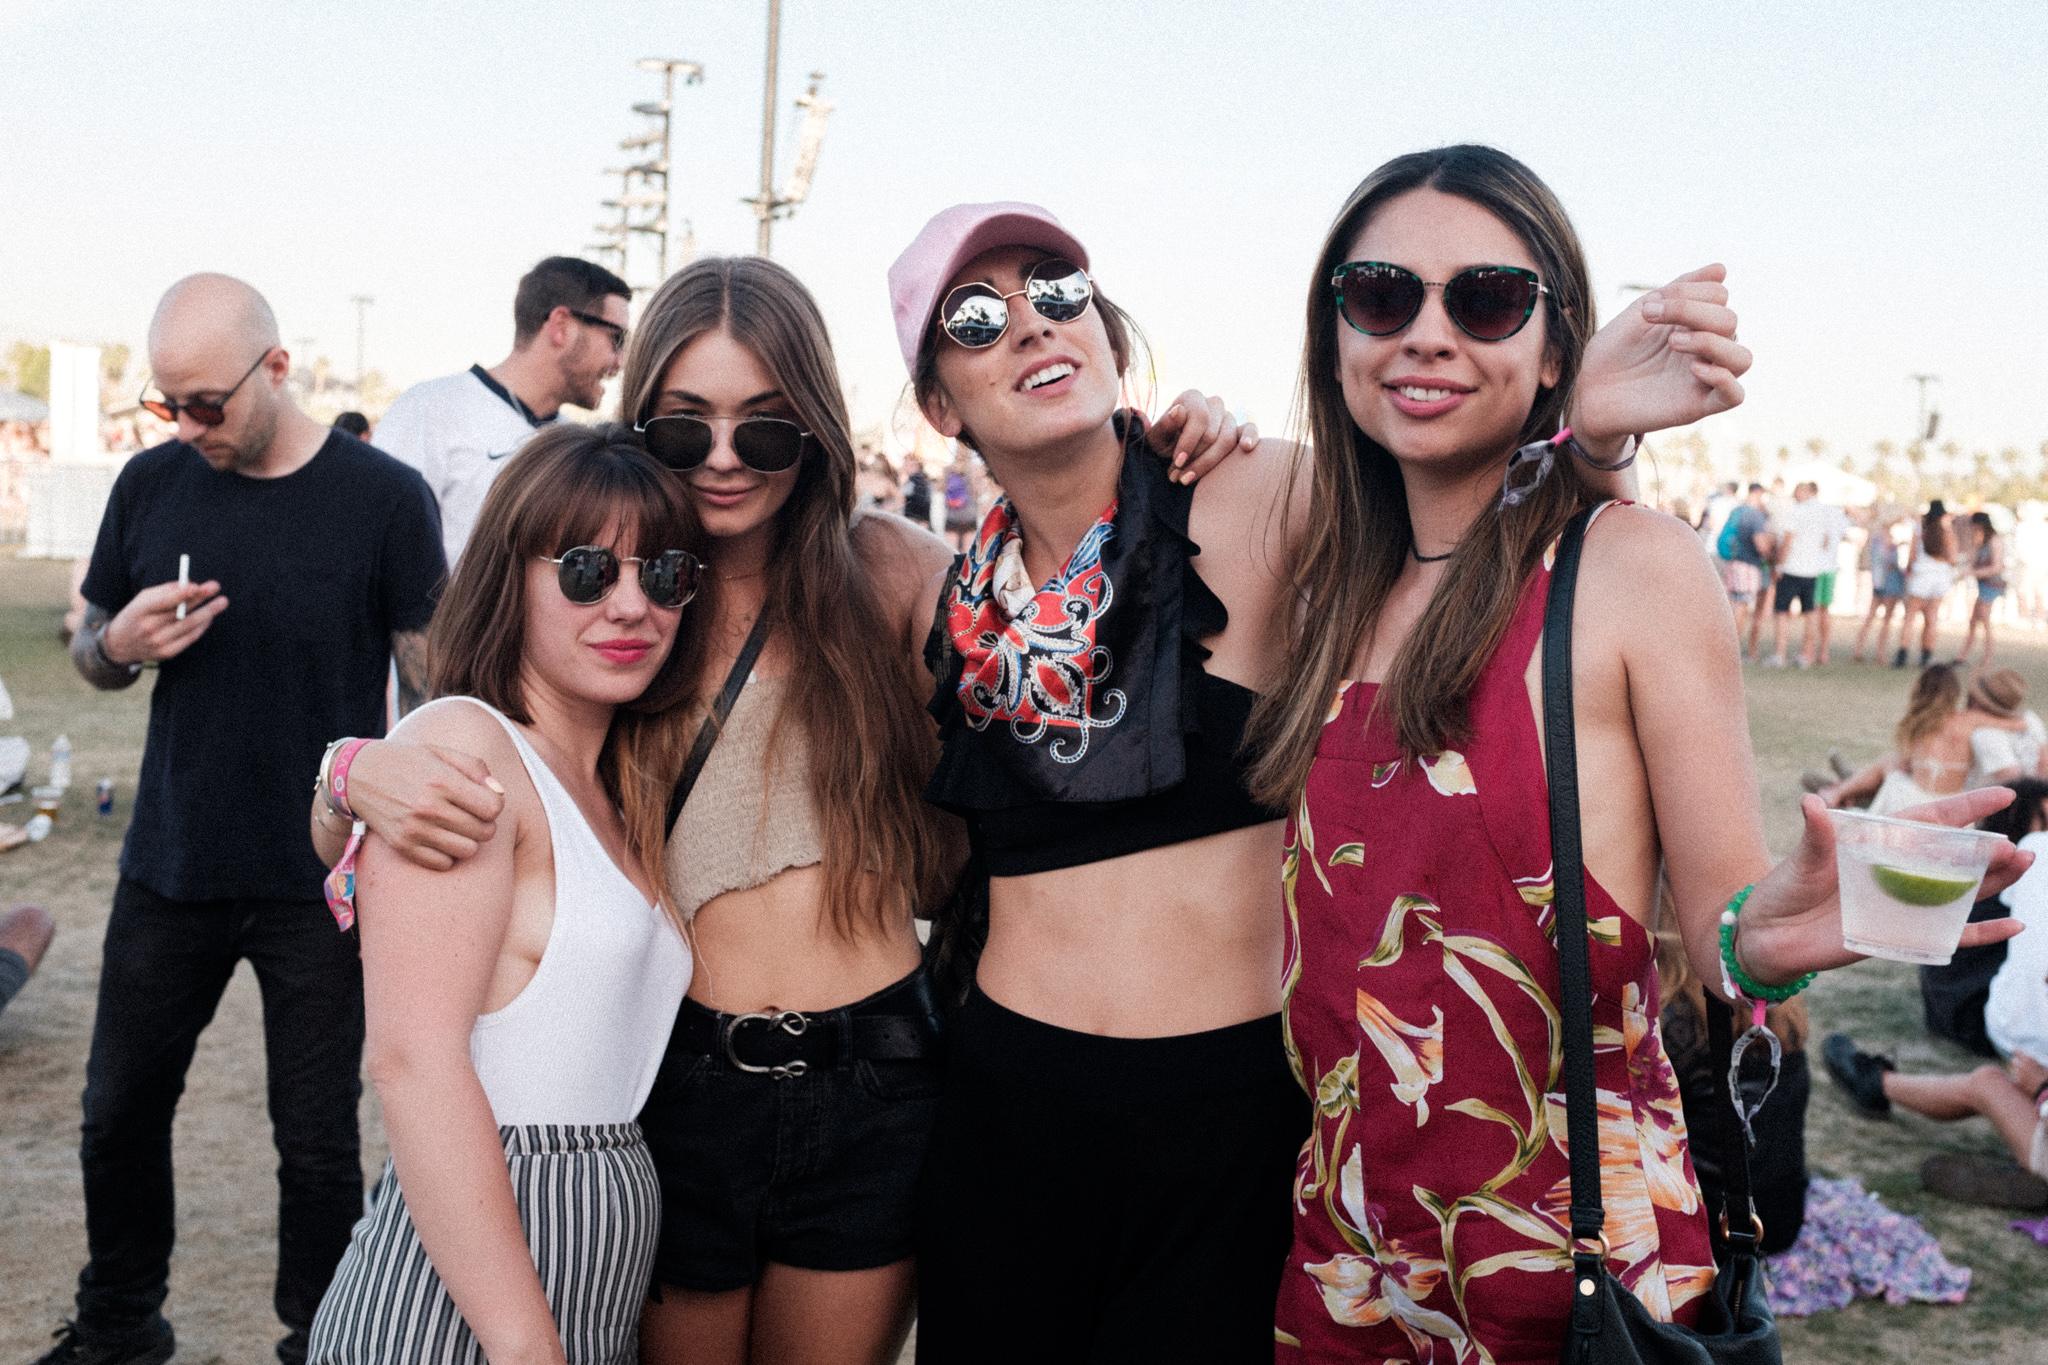 170423 Coachella 17 w2 2010.jpg